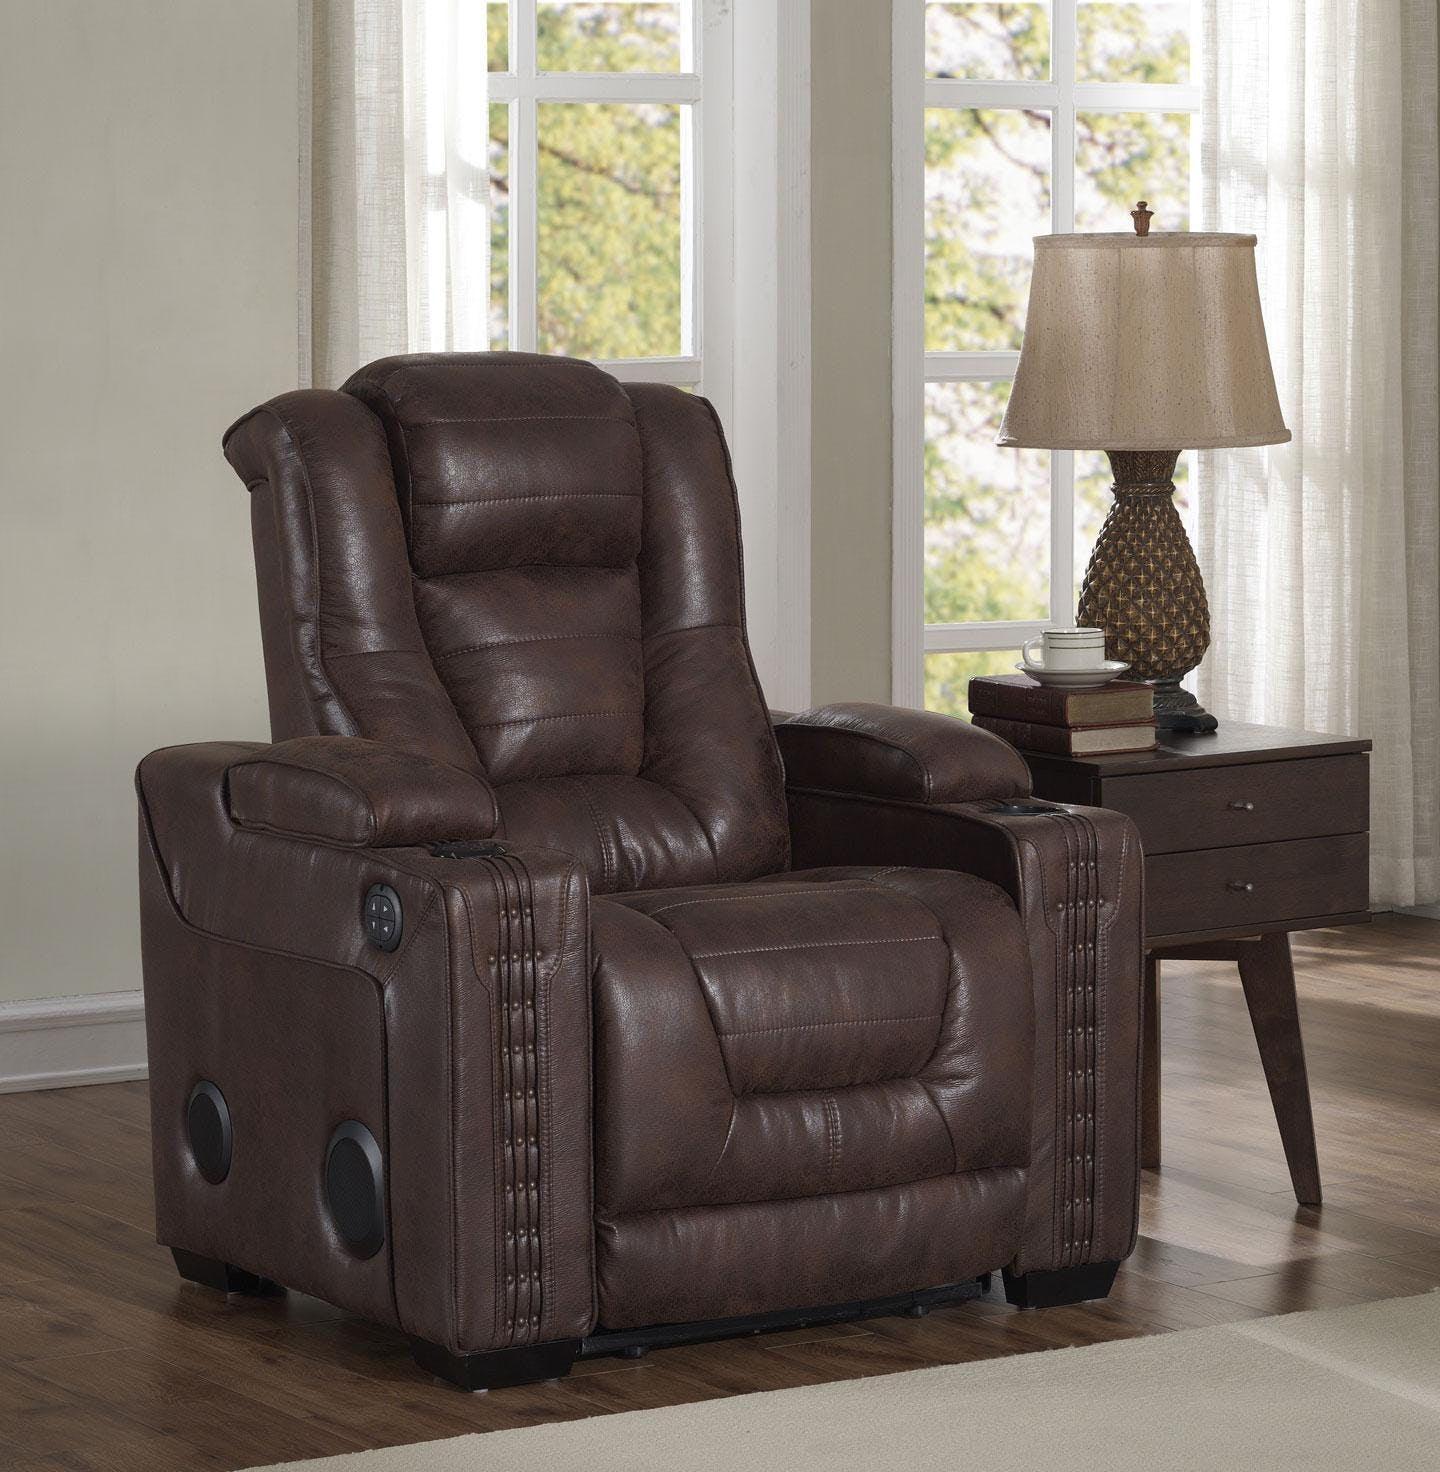 Prime Resources International Living Room Eric Church Power Recliner 052720 Furniture Fair